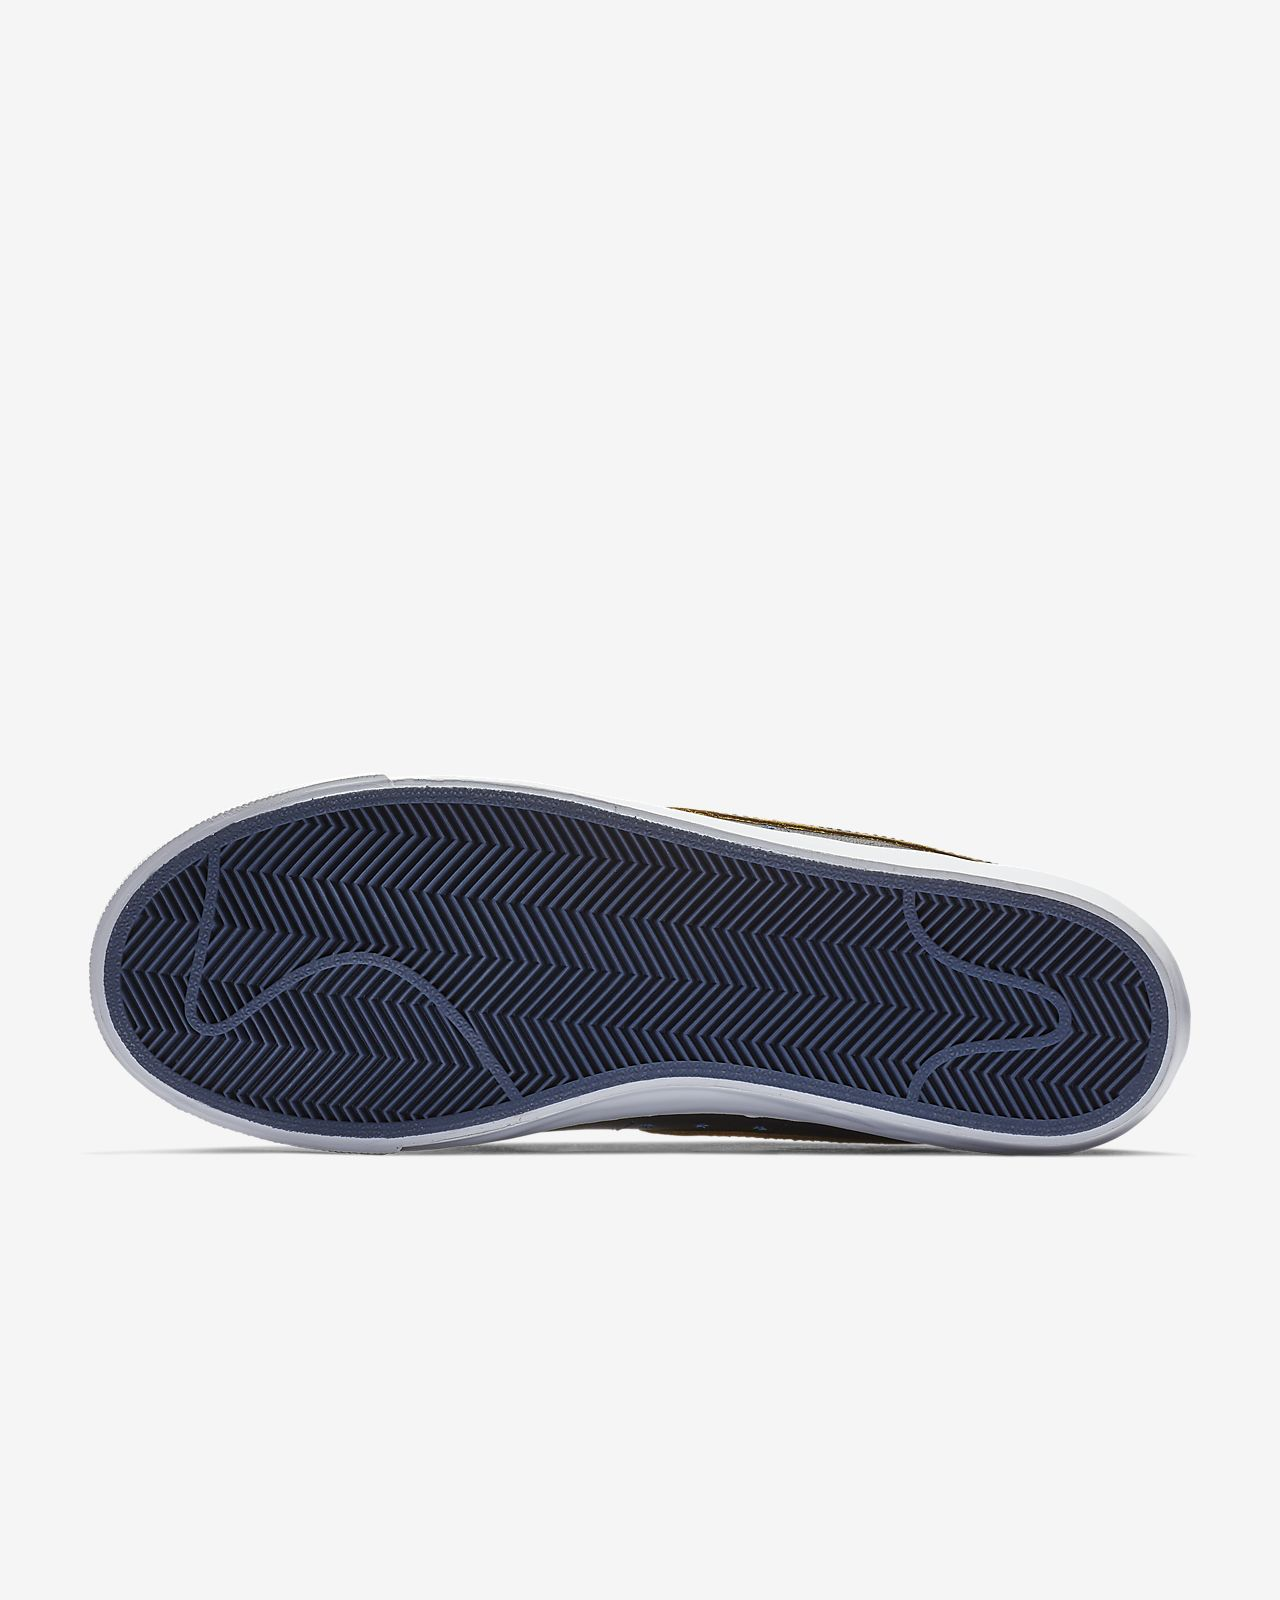 new concept dbb6e 36df1 ... Skateboardsko Nike SB Blazer Low GT NBA för män